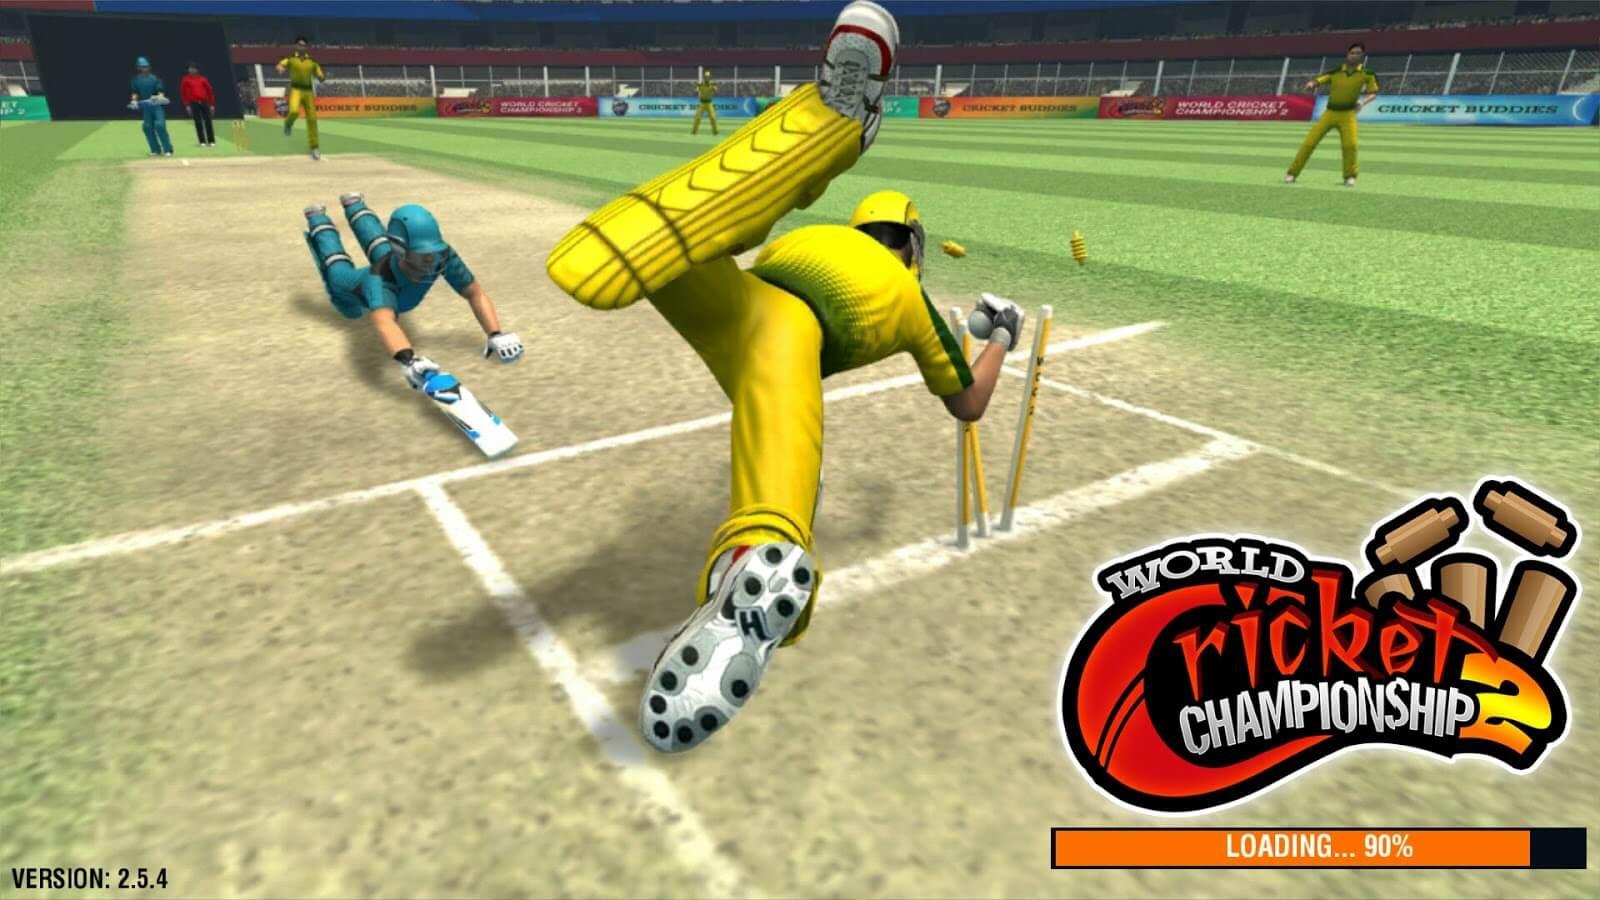 Download World Cricket Chempionship 2 Mod Apk-Get [Mods/Data/Unlocks]